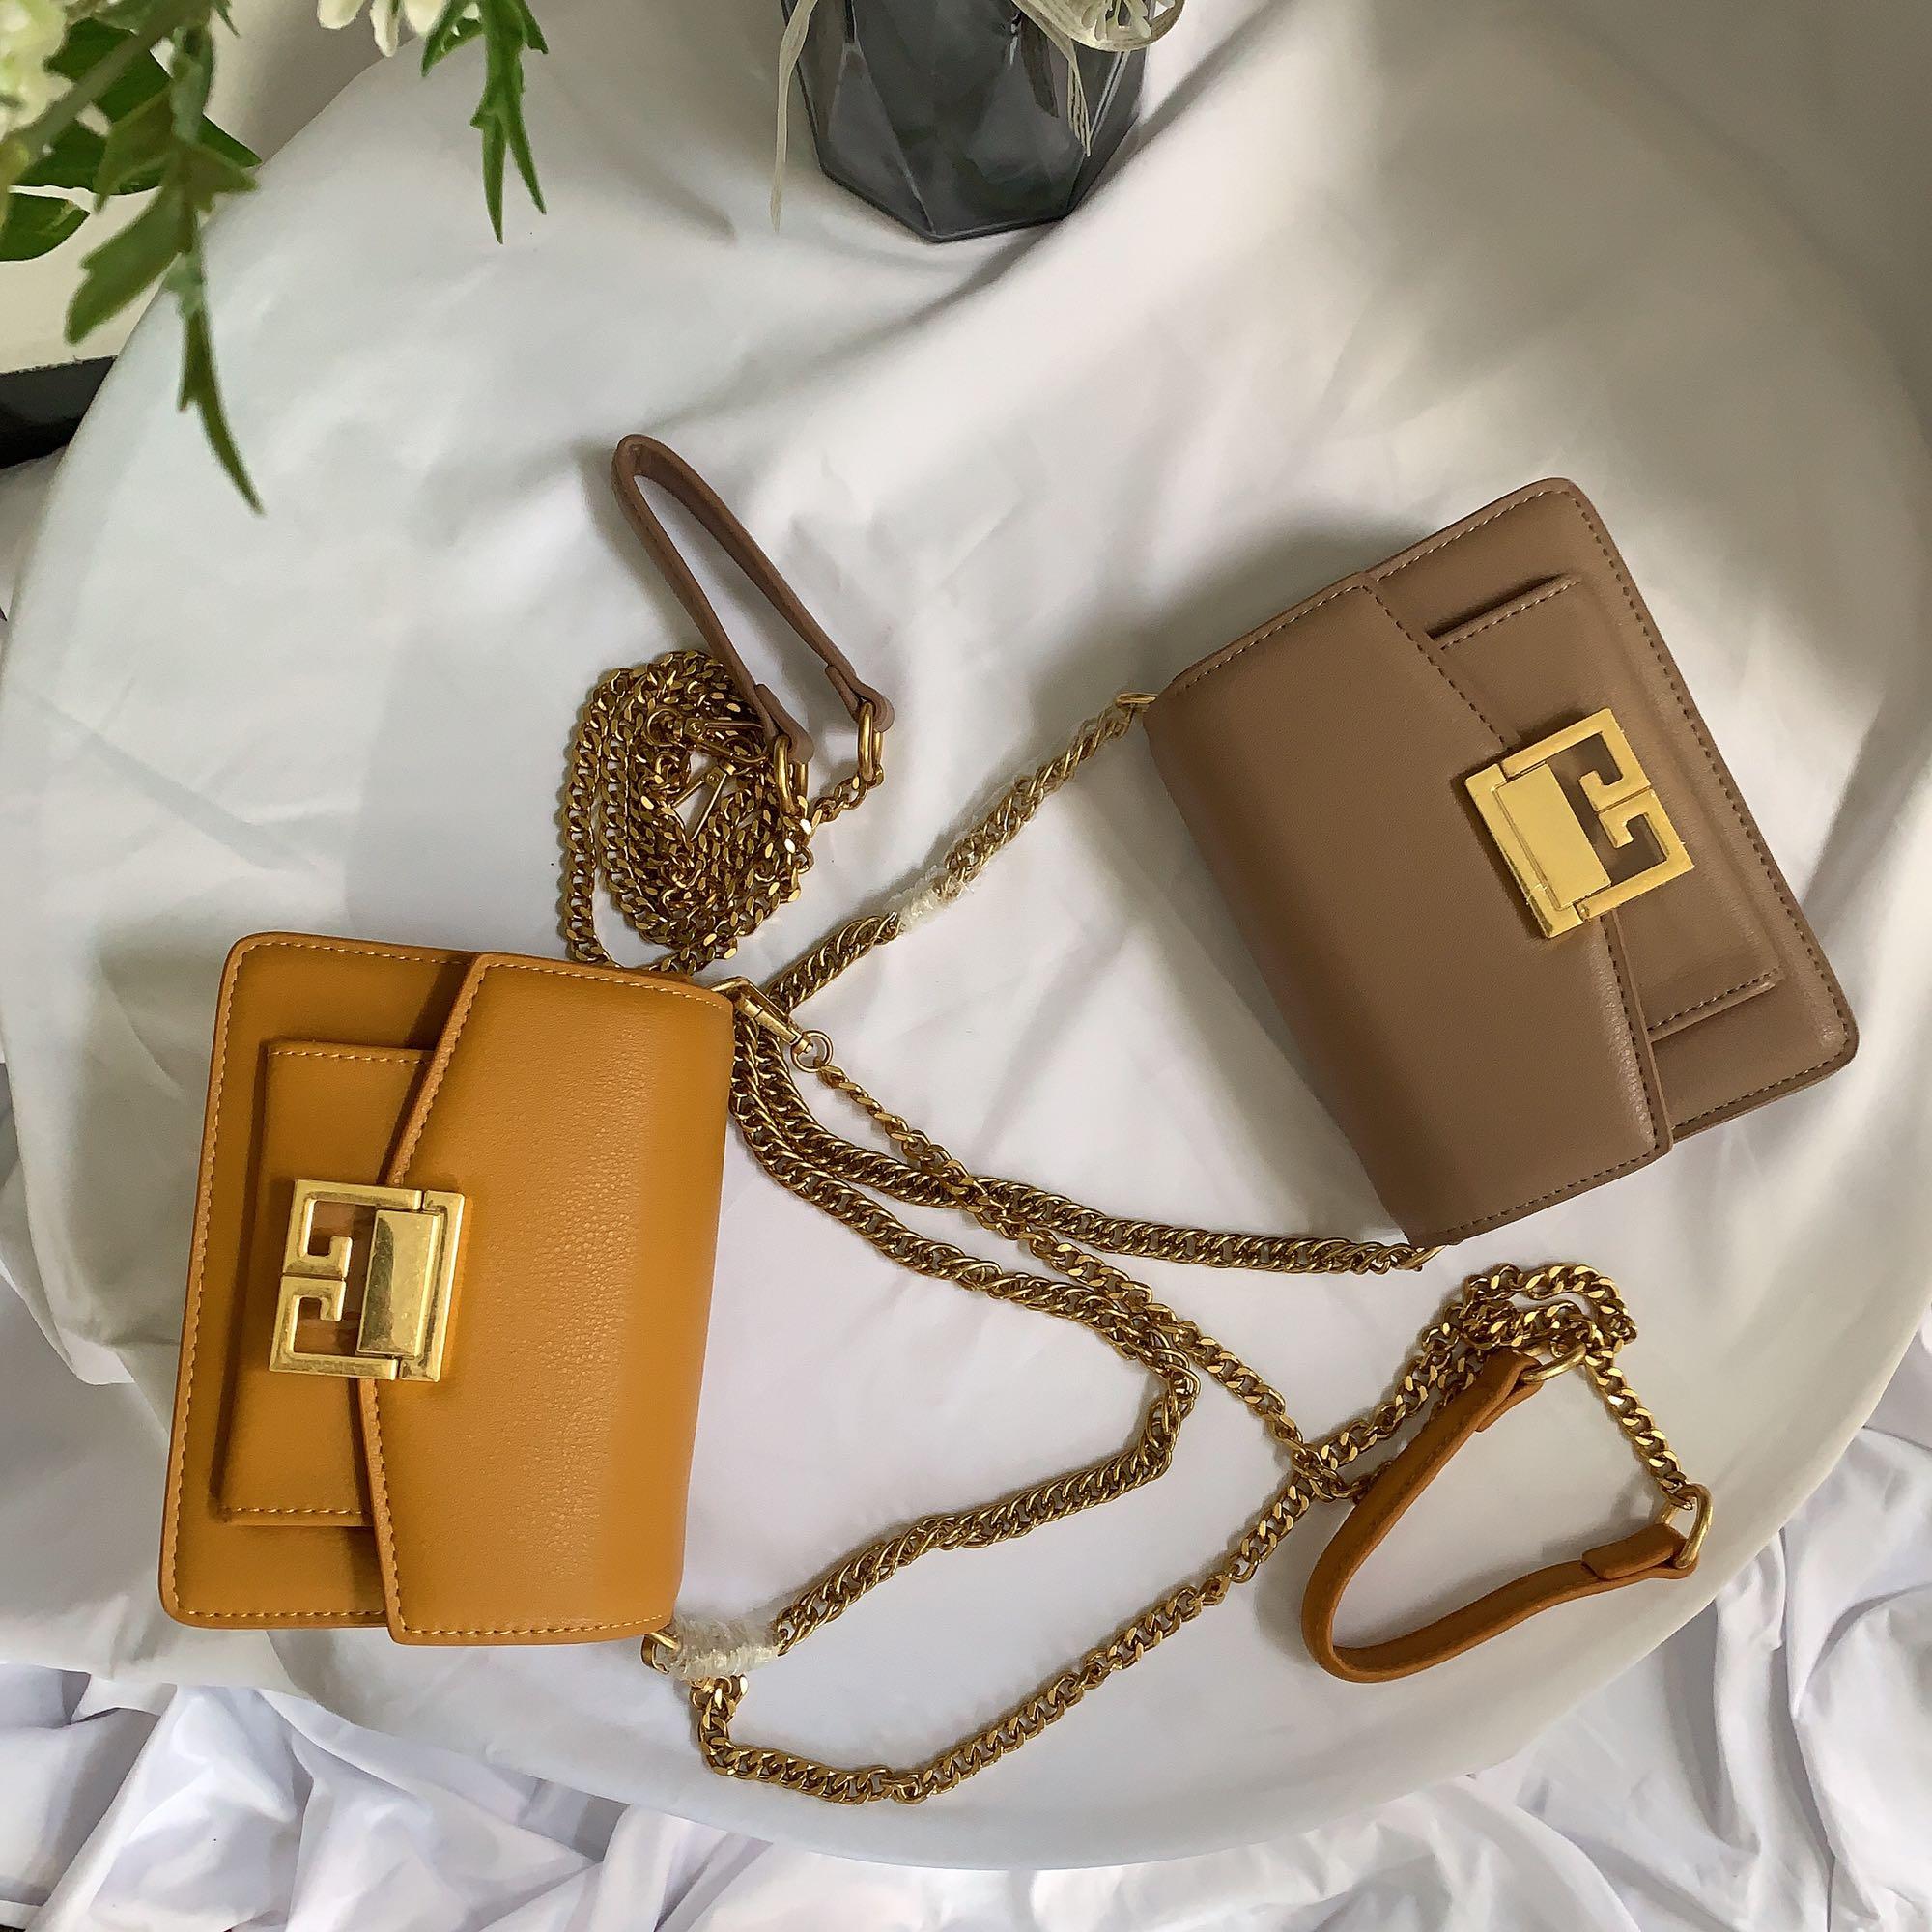 Womens bag 2020 new popular fashion retro simple one shoulder messenger bag chain bag leisure saddle bag